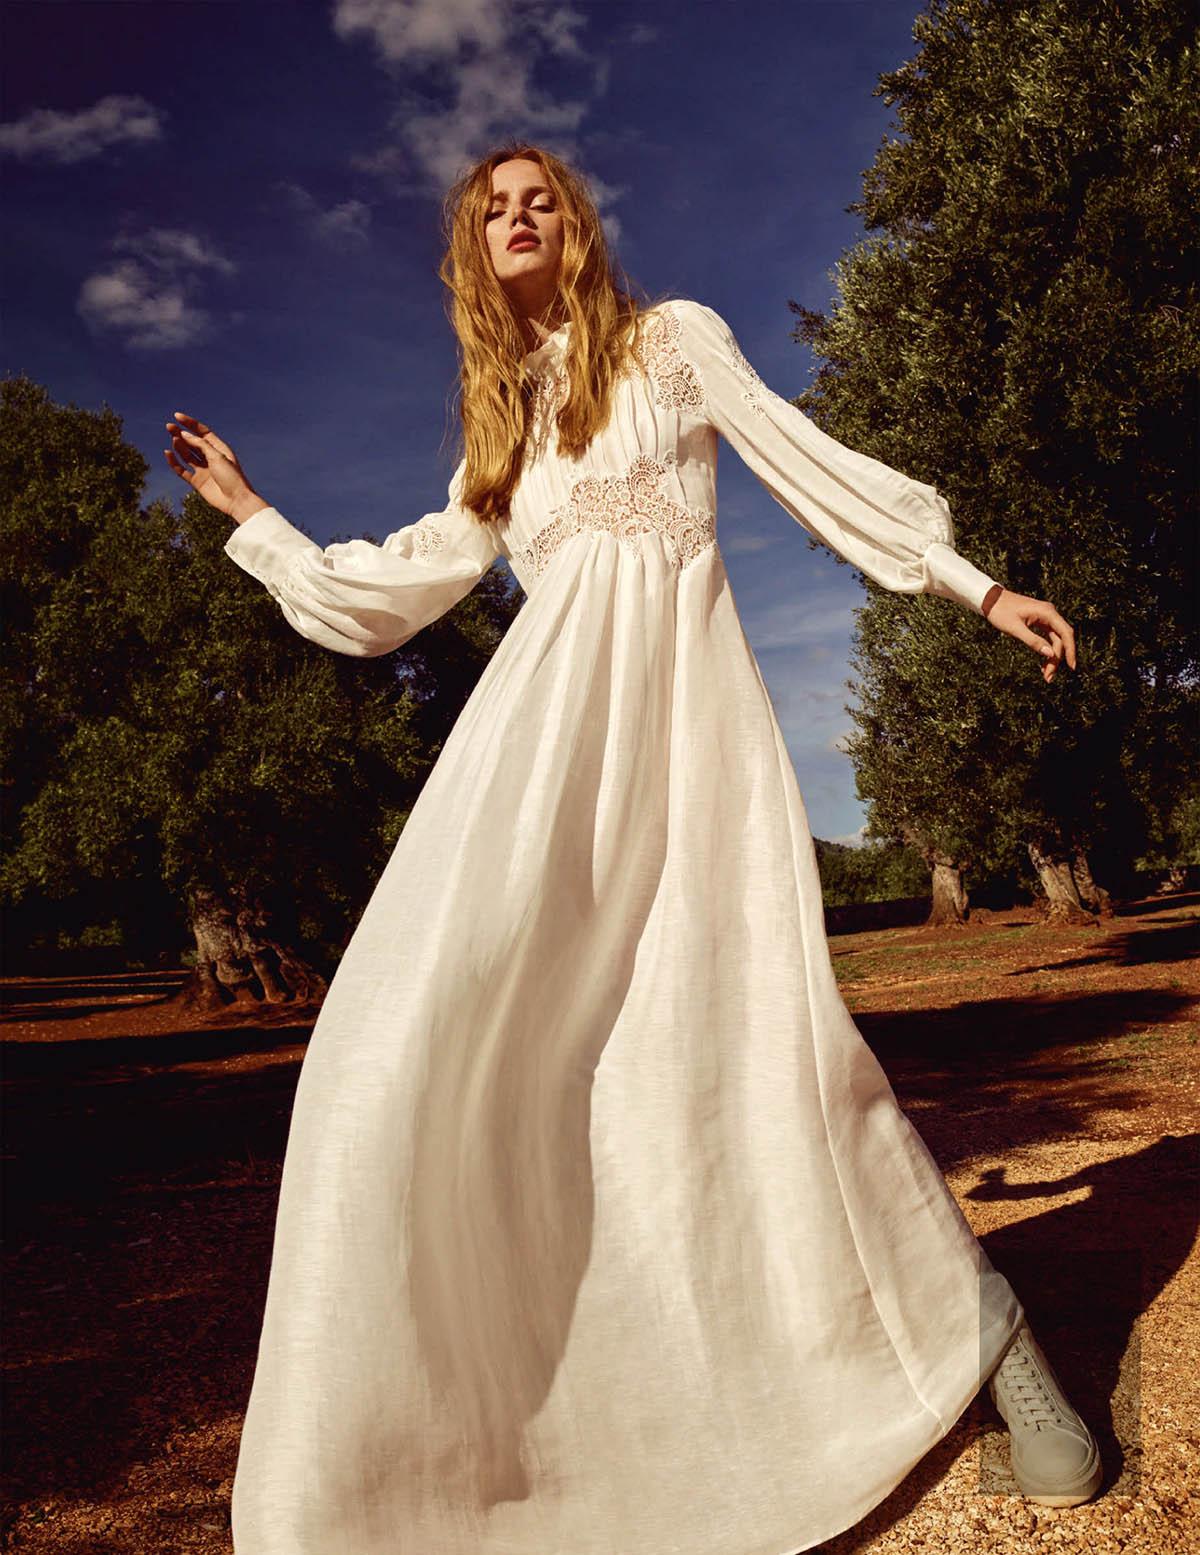 Rianne van Rompaey covers Vogue Japan February 2021 by Luigi & Iango